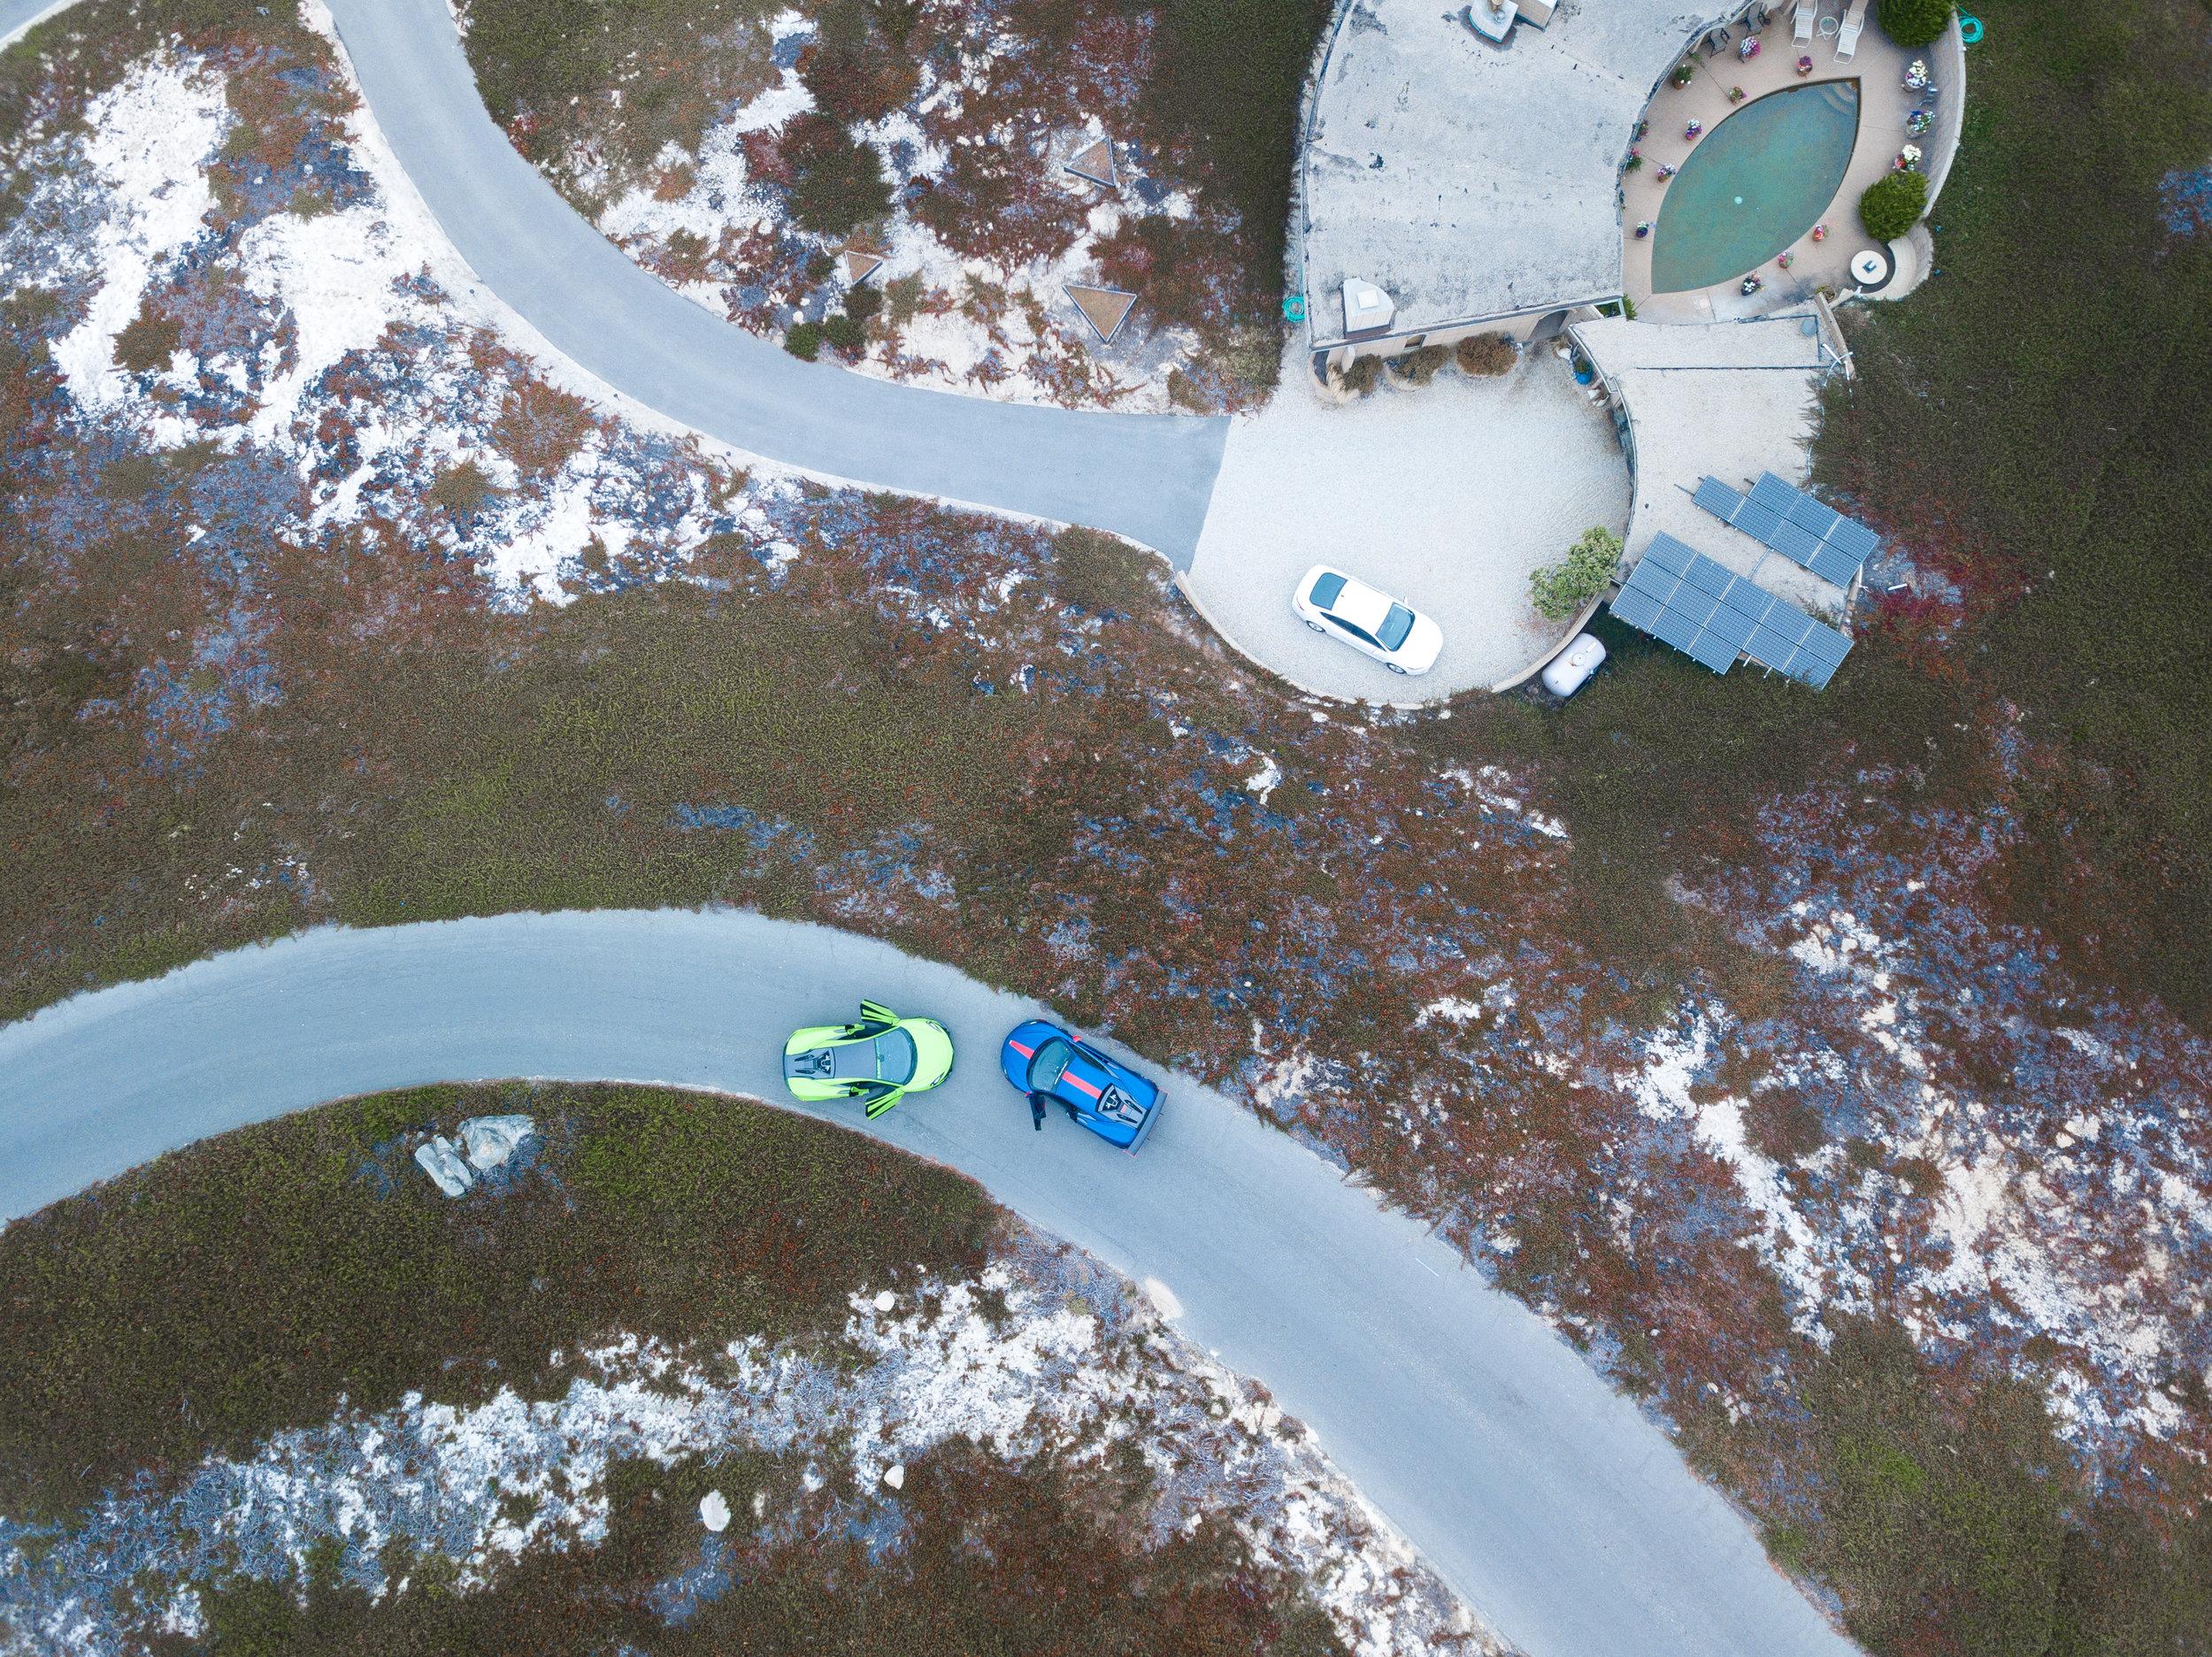 Stay_Driven_Monterey_Mclarens_DRONE-27.jpg